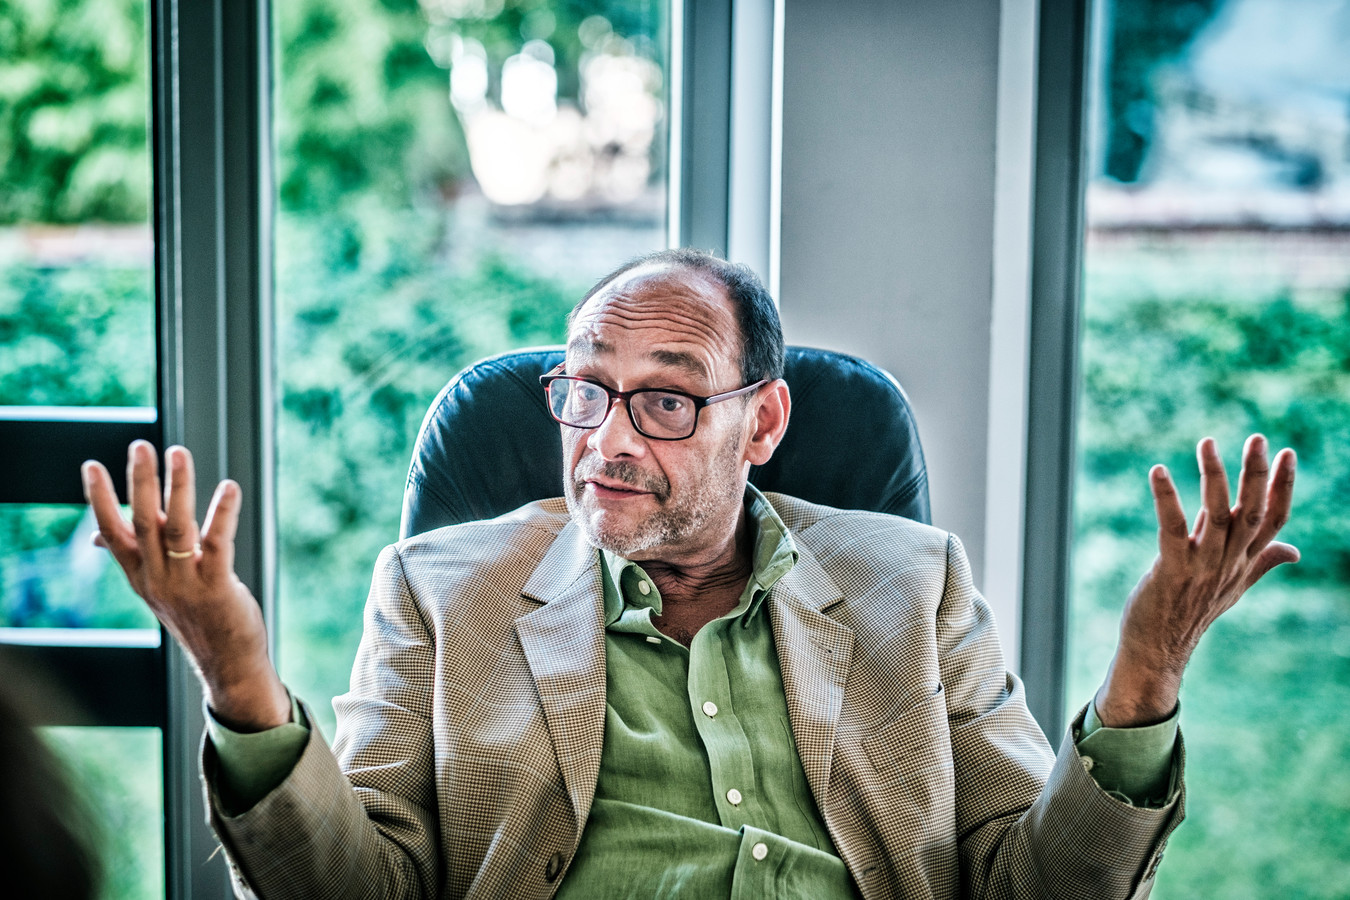 Grondwetspecialist Marc Uyttendaele.